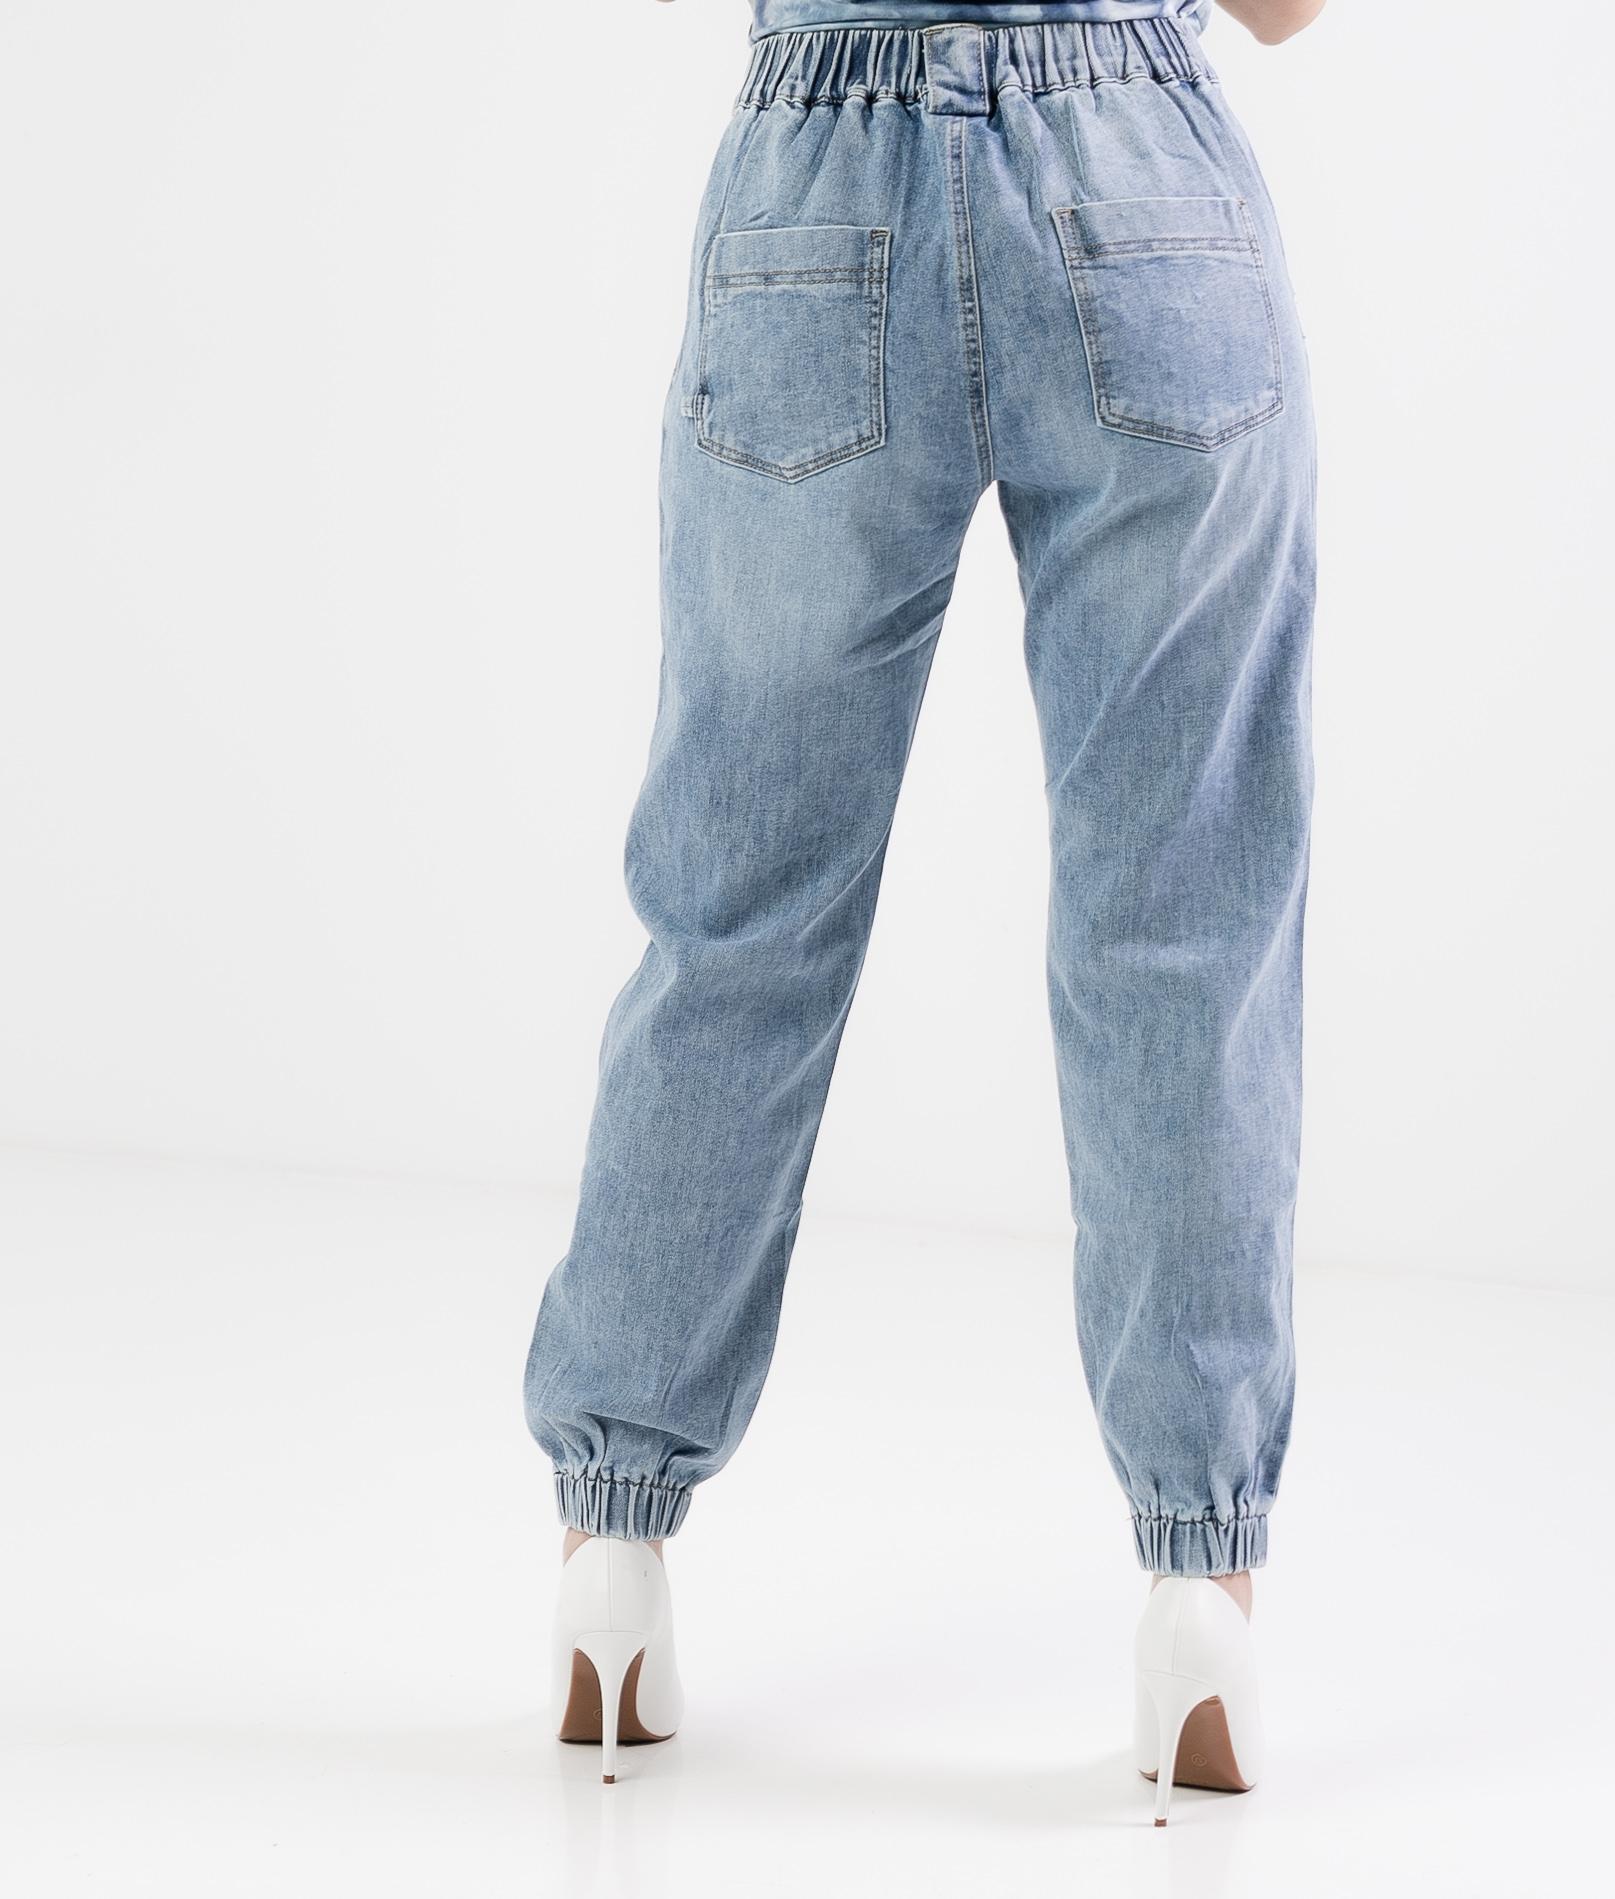 Mibusa Trousers - Denim